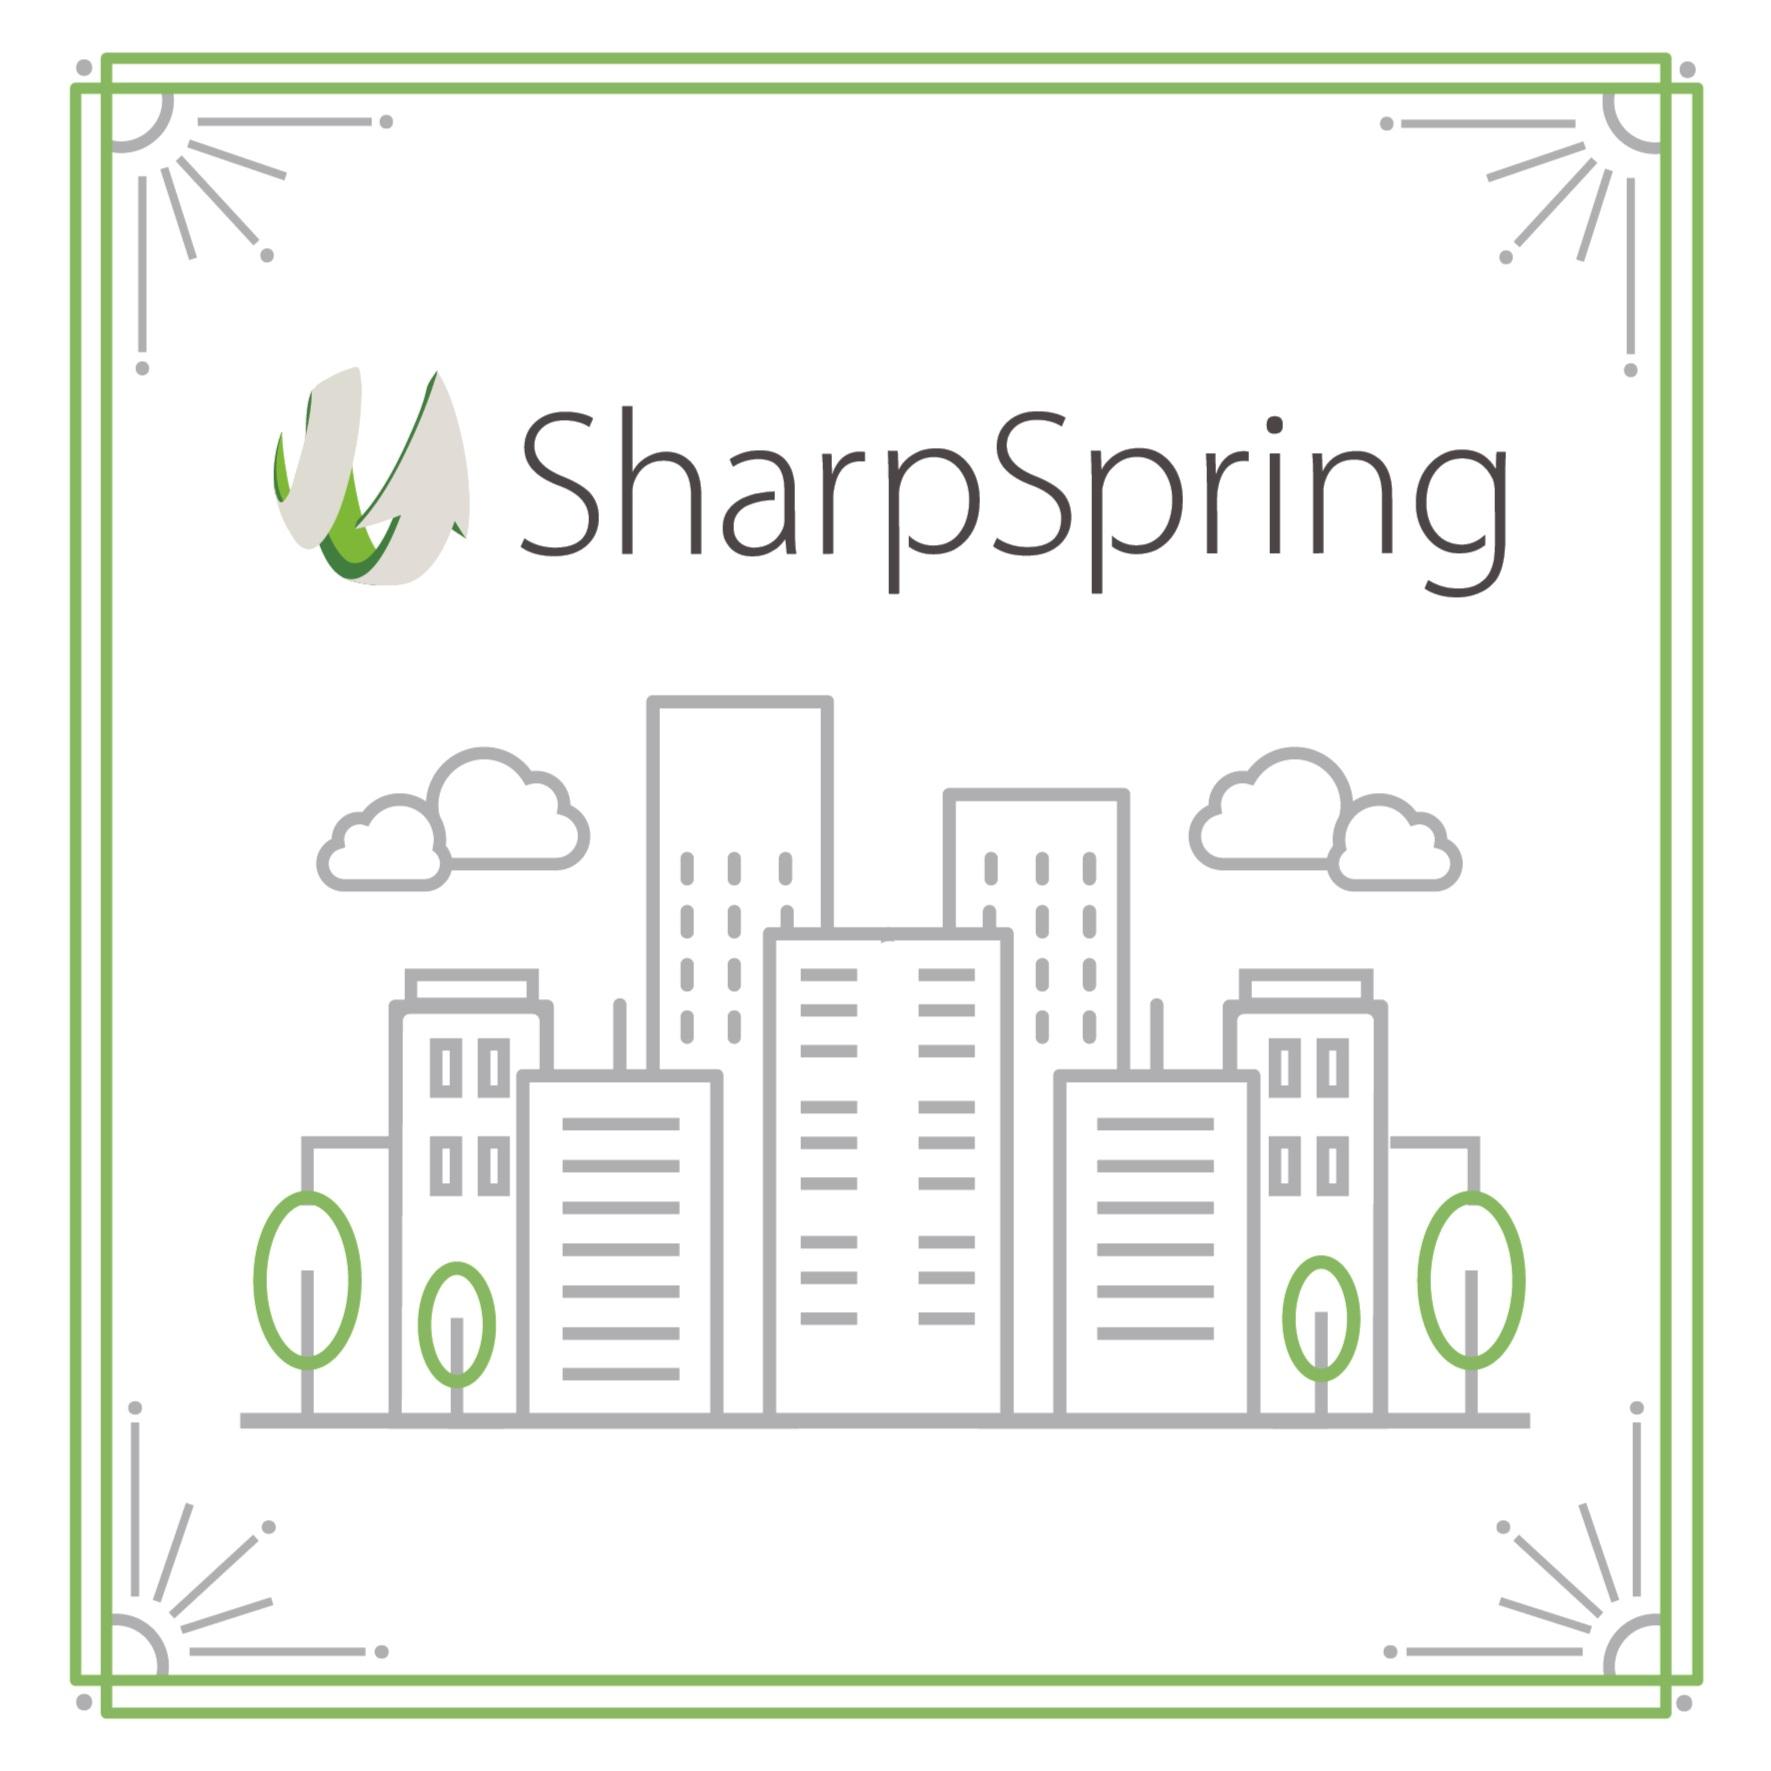 sharpspring-invitation-07.png